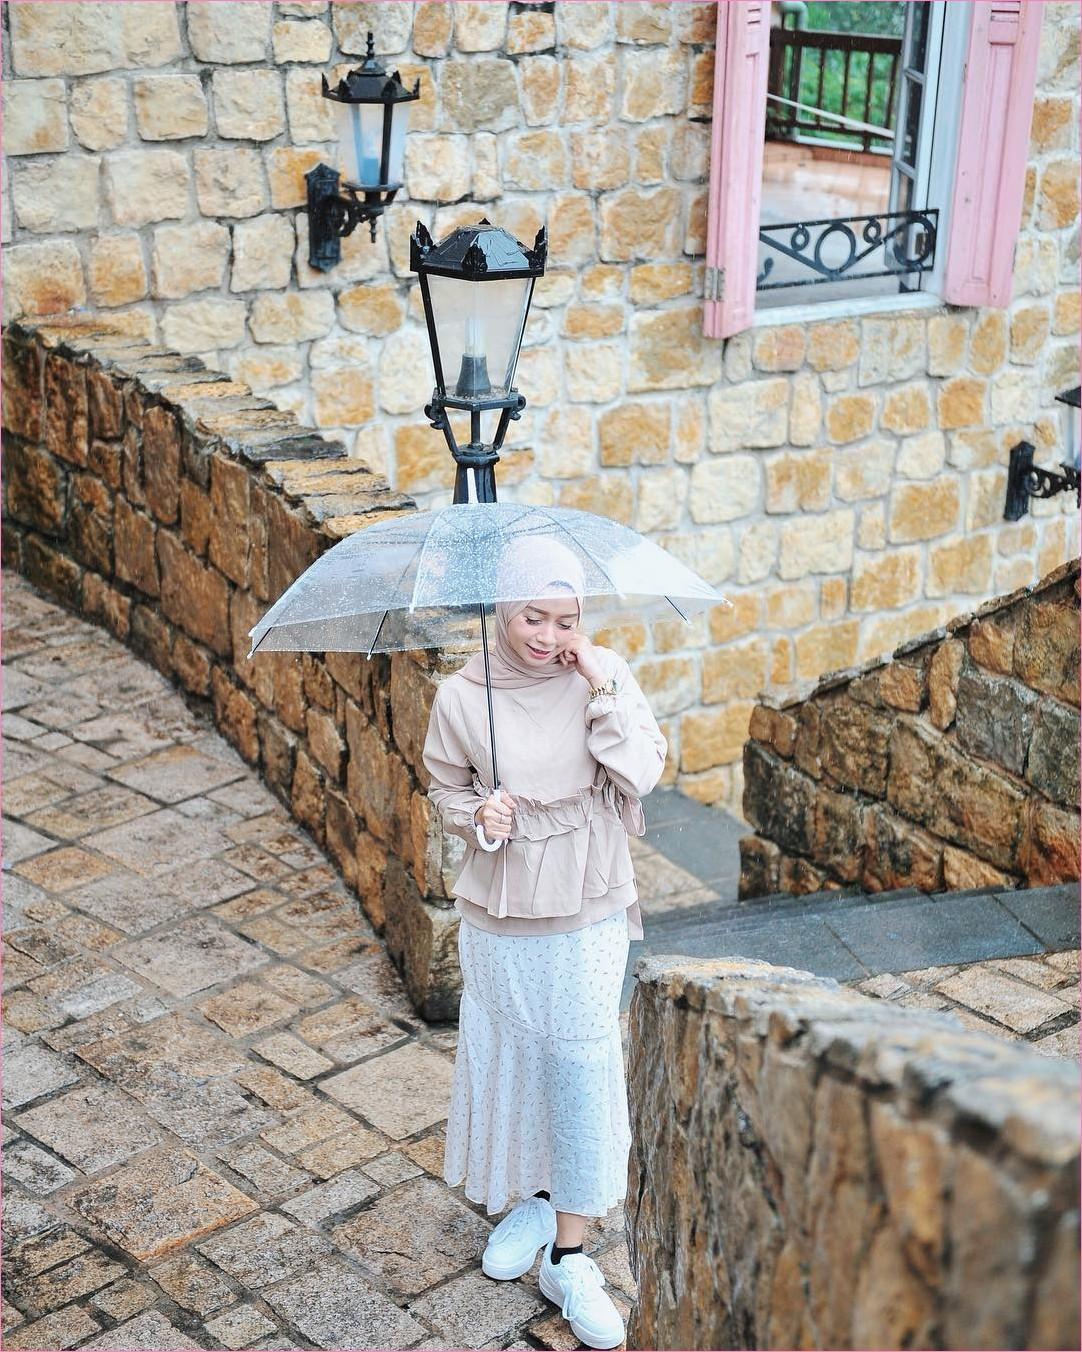 Outfit Rok Untuk Hijabers Ala Selebgram 2018 rok polkadot A-line kets sneakers putih kaos kaki hitam hijab pashmina diamond blouse tunic krem payung transparan jam tangan ootd trendy